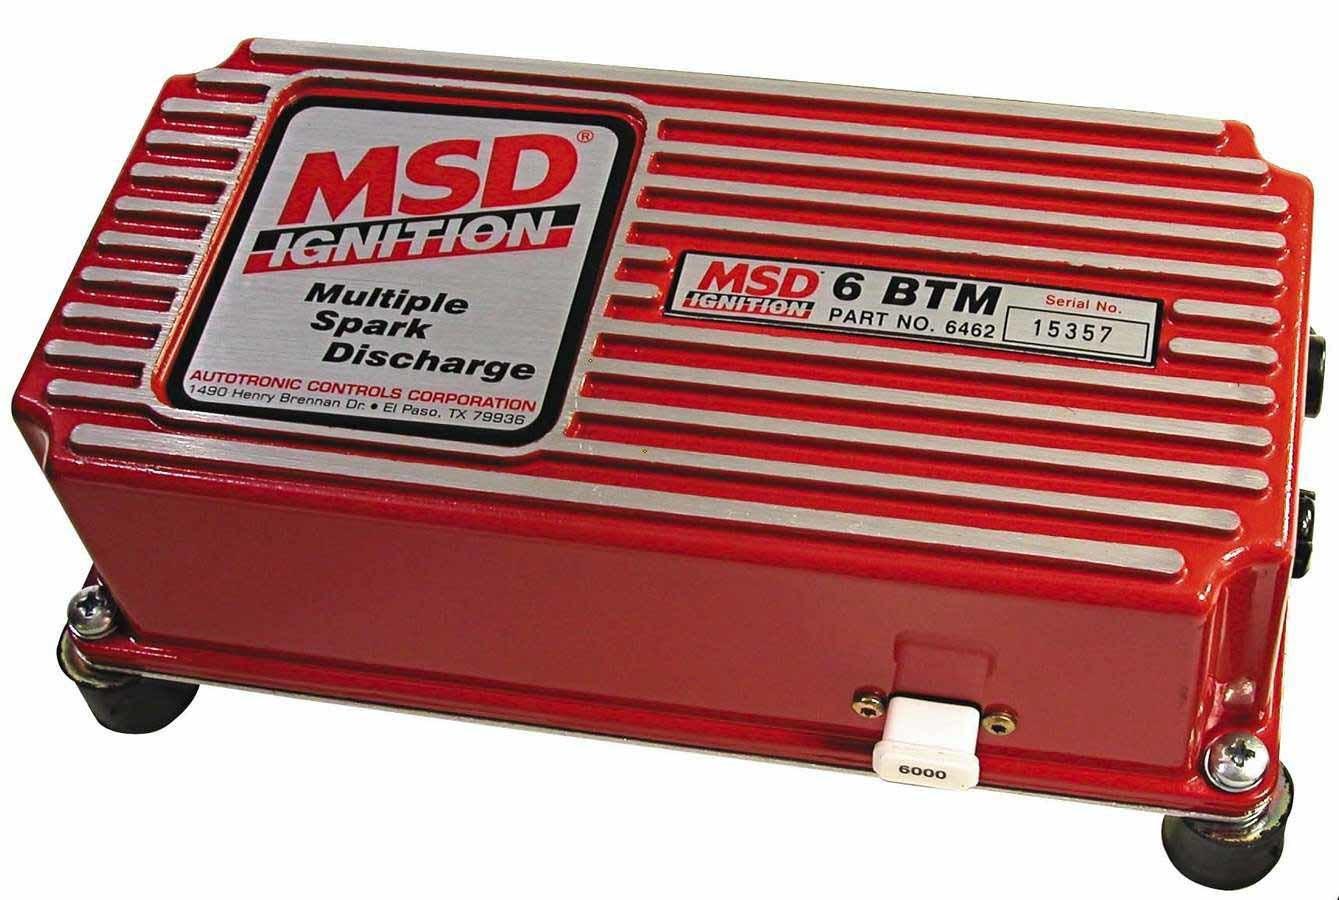 MSD Ignition 6462 Ignition Box, 6 BTM, Analog, CD Ignition, Multi-Spark, 45000V, Boost Retard Dial, Soft Touch Rev Limiter, Each